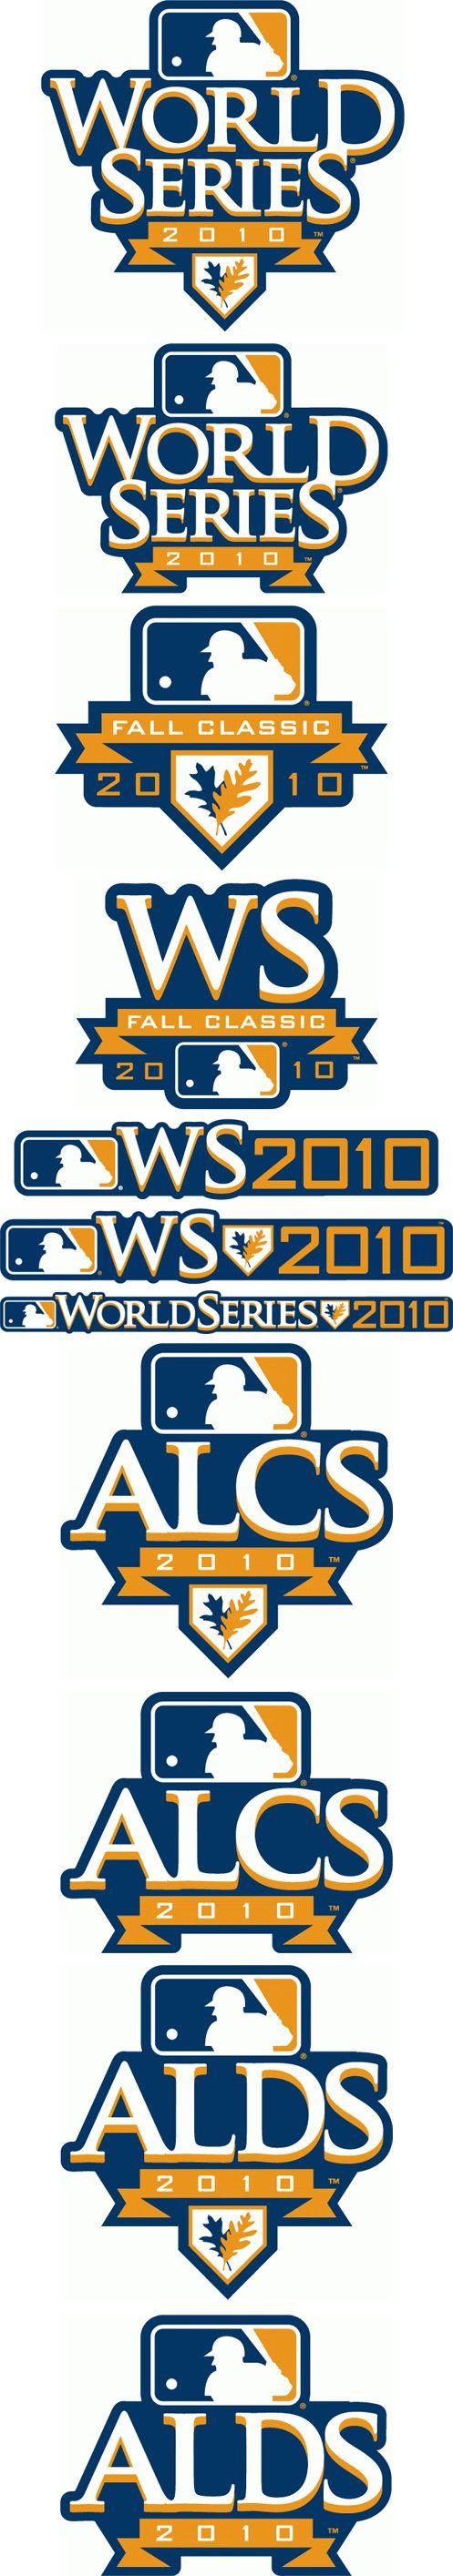 Esports Logo Design Ideas  logo design ideas